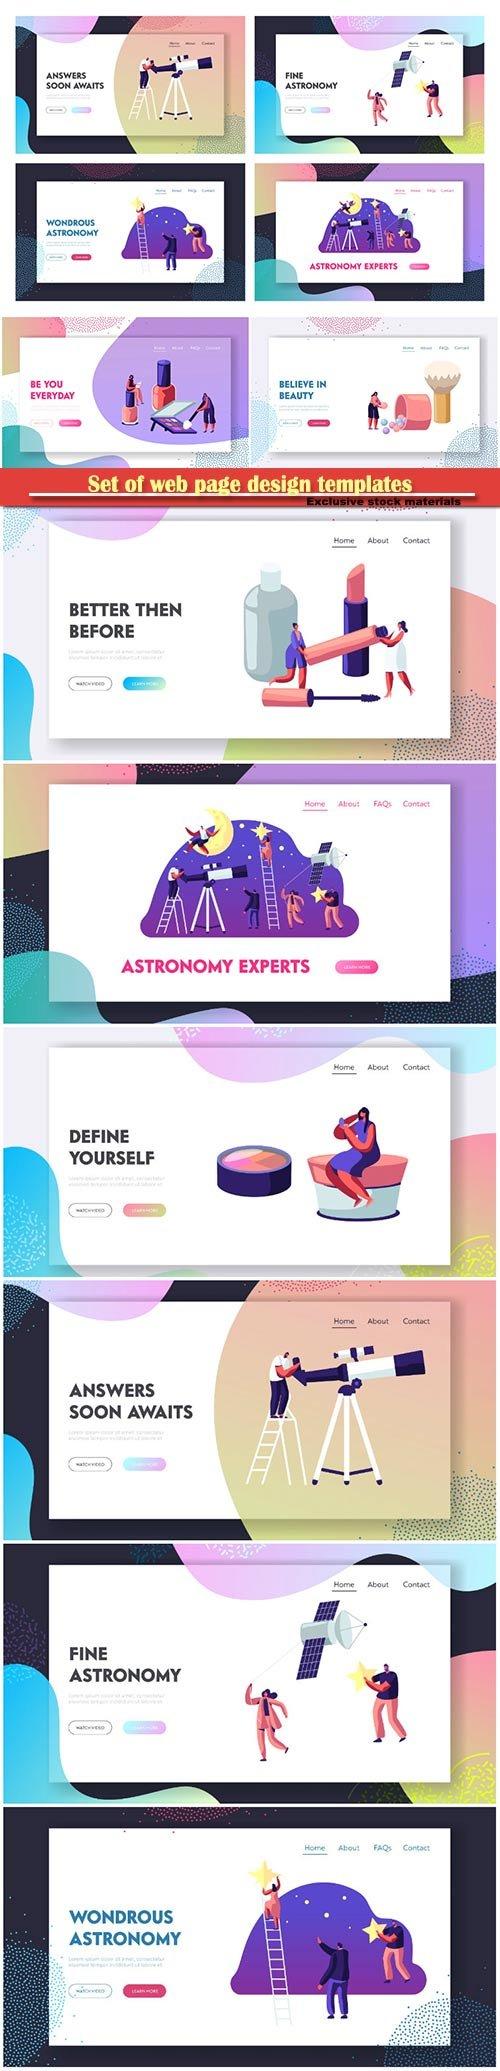 Set of web page design templates vector illustration concepts for website